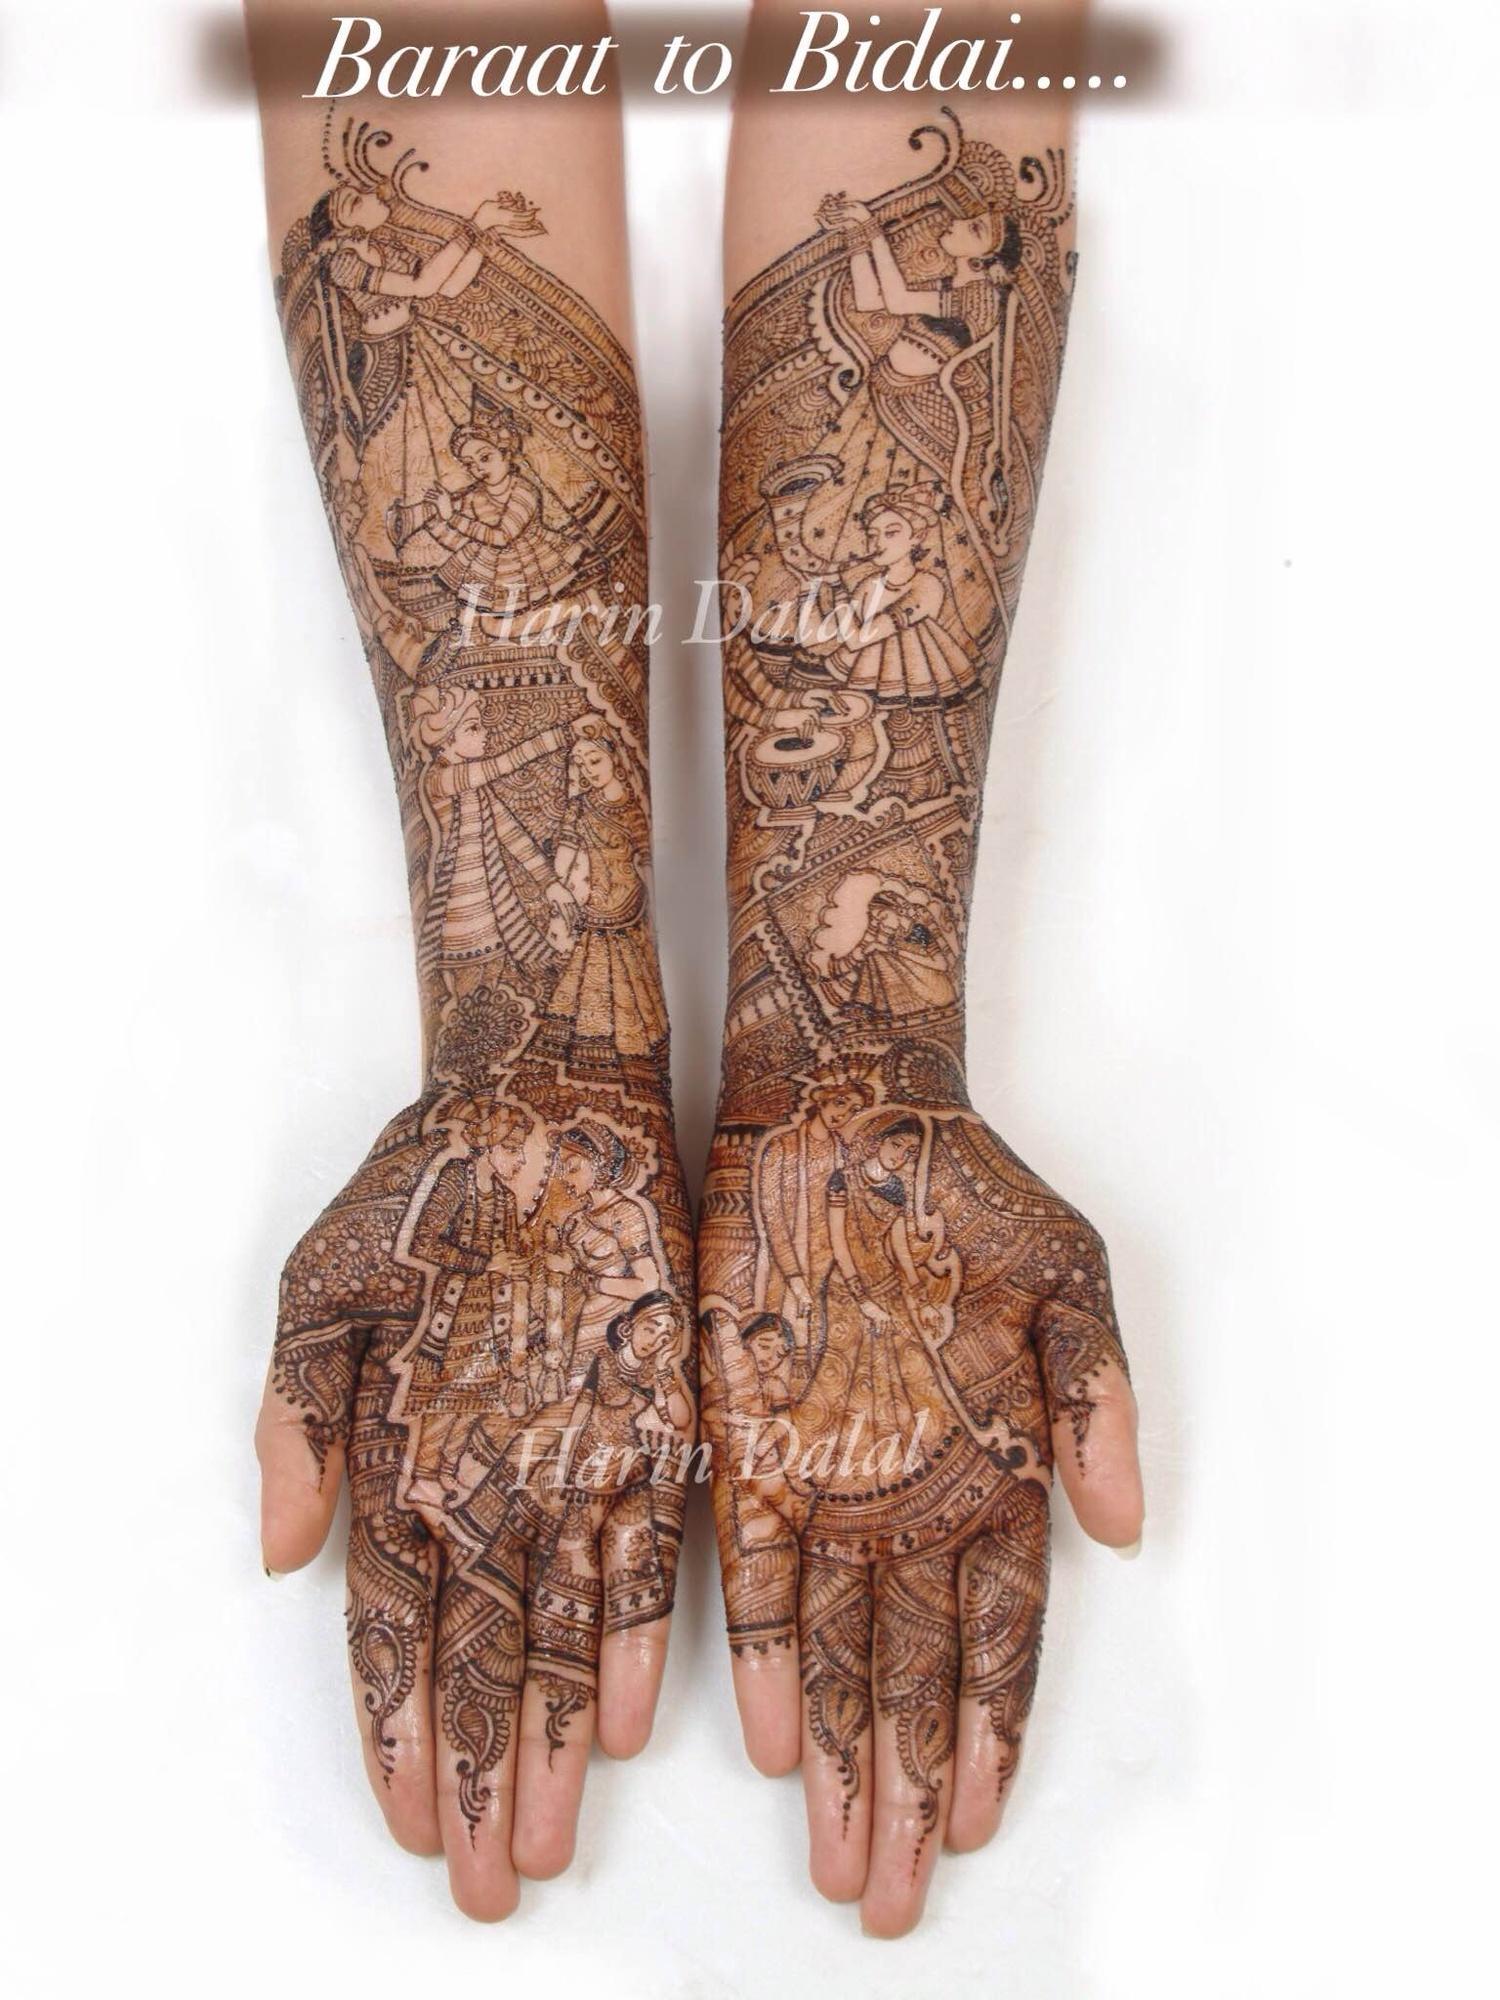 Bridal Mehndi Artist In Surat : Harin dalal bridal mehendi artist mehndi in